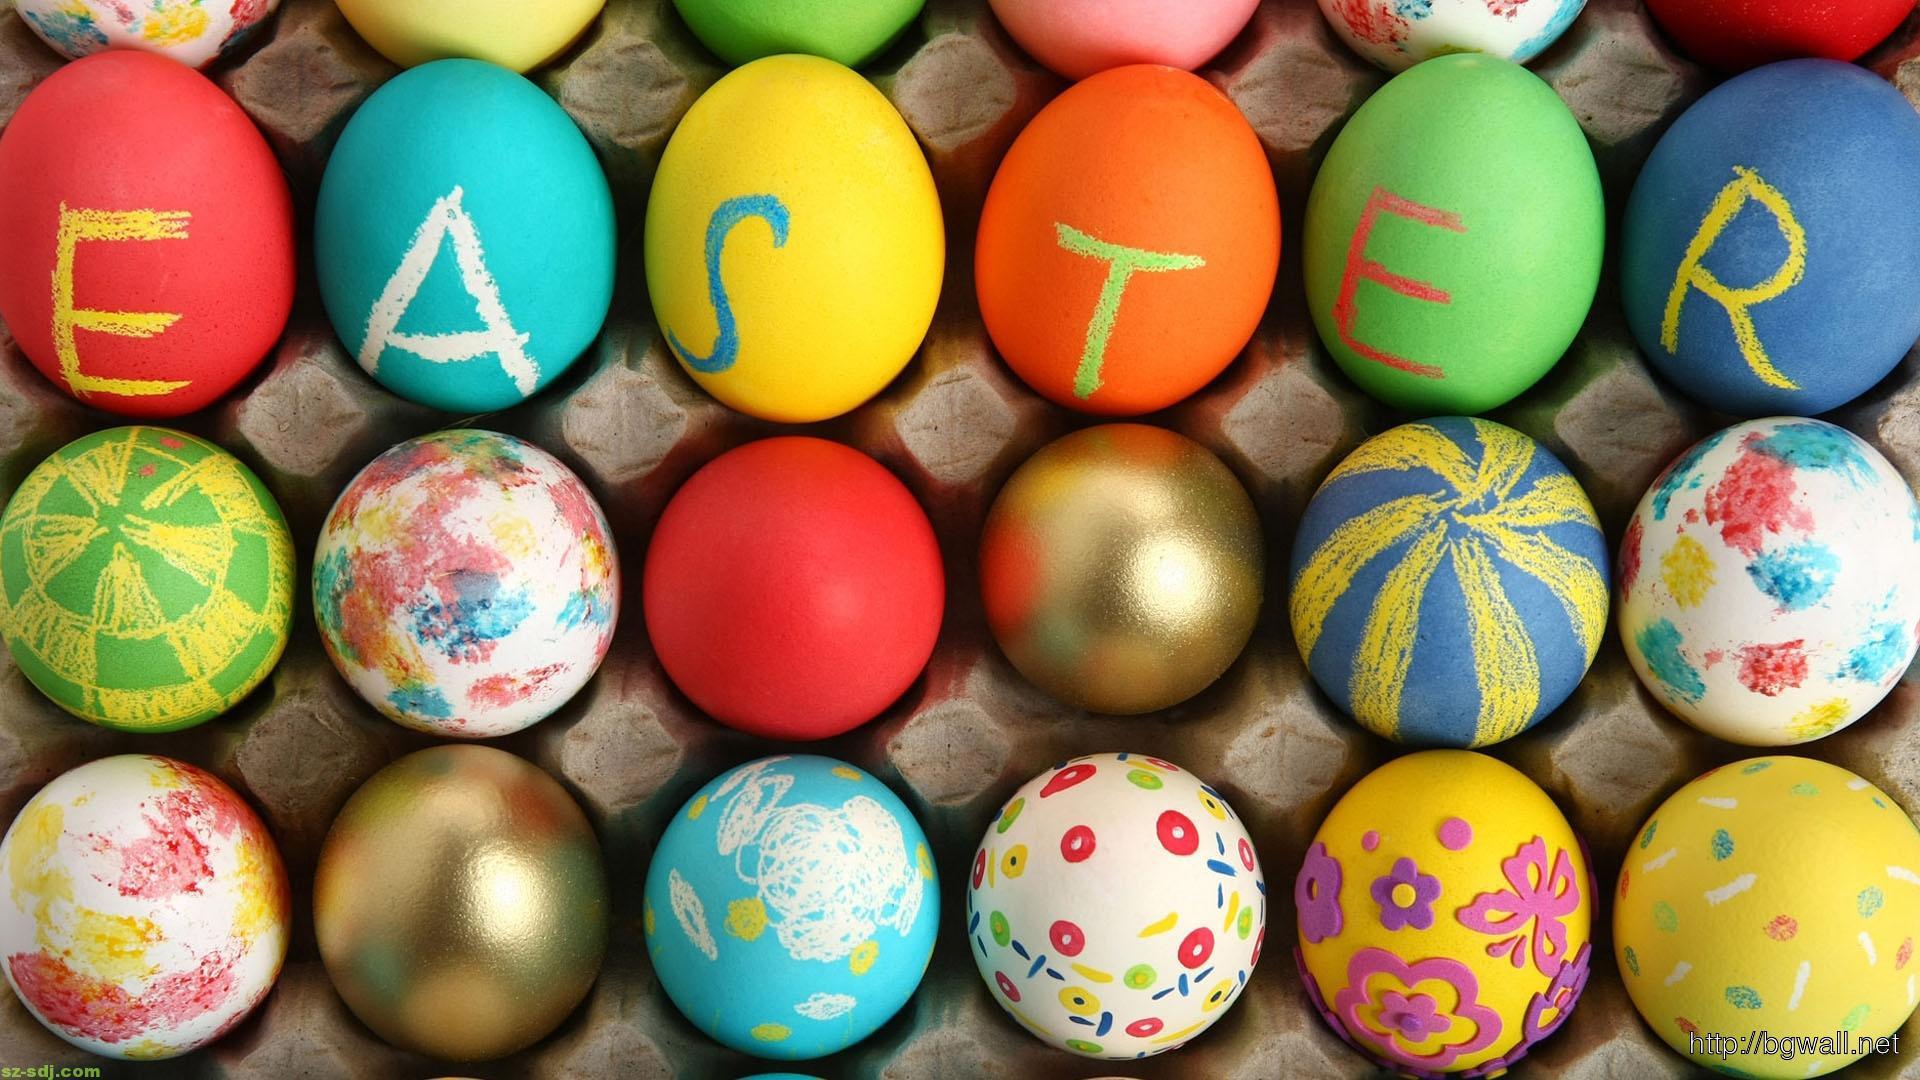 colorful-easter-eggs-desktop-wallpaper-download